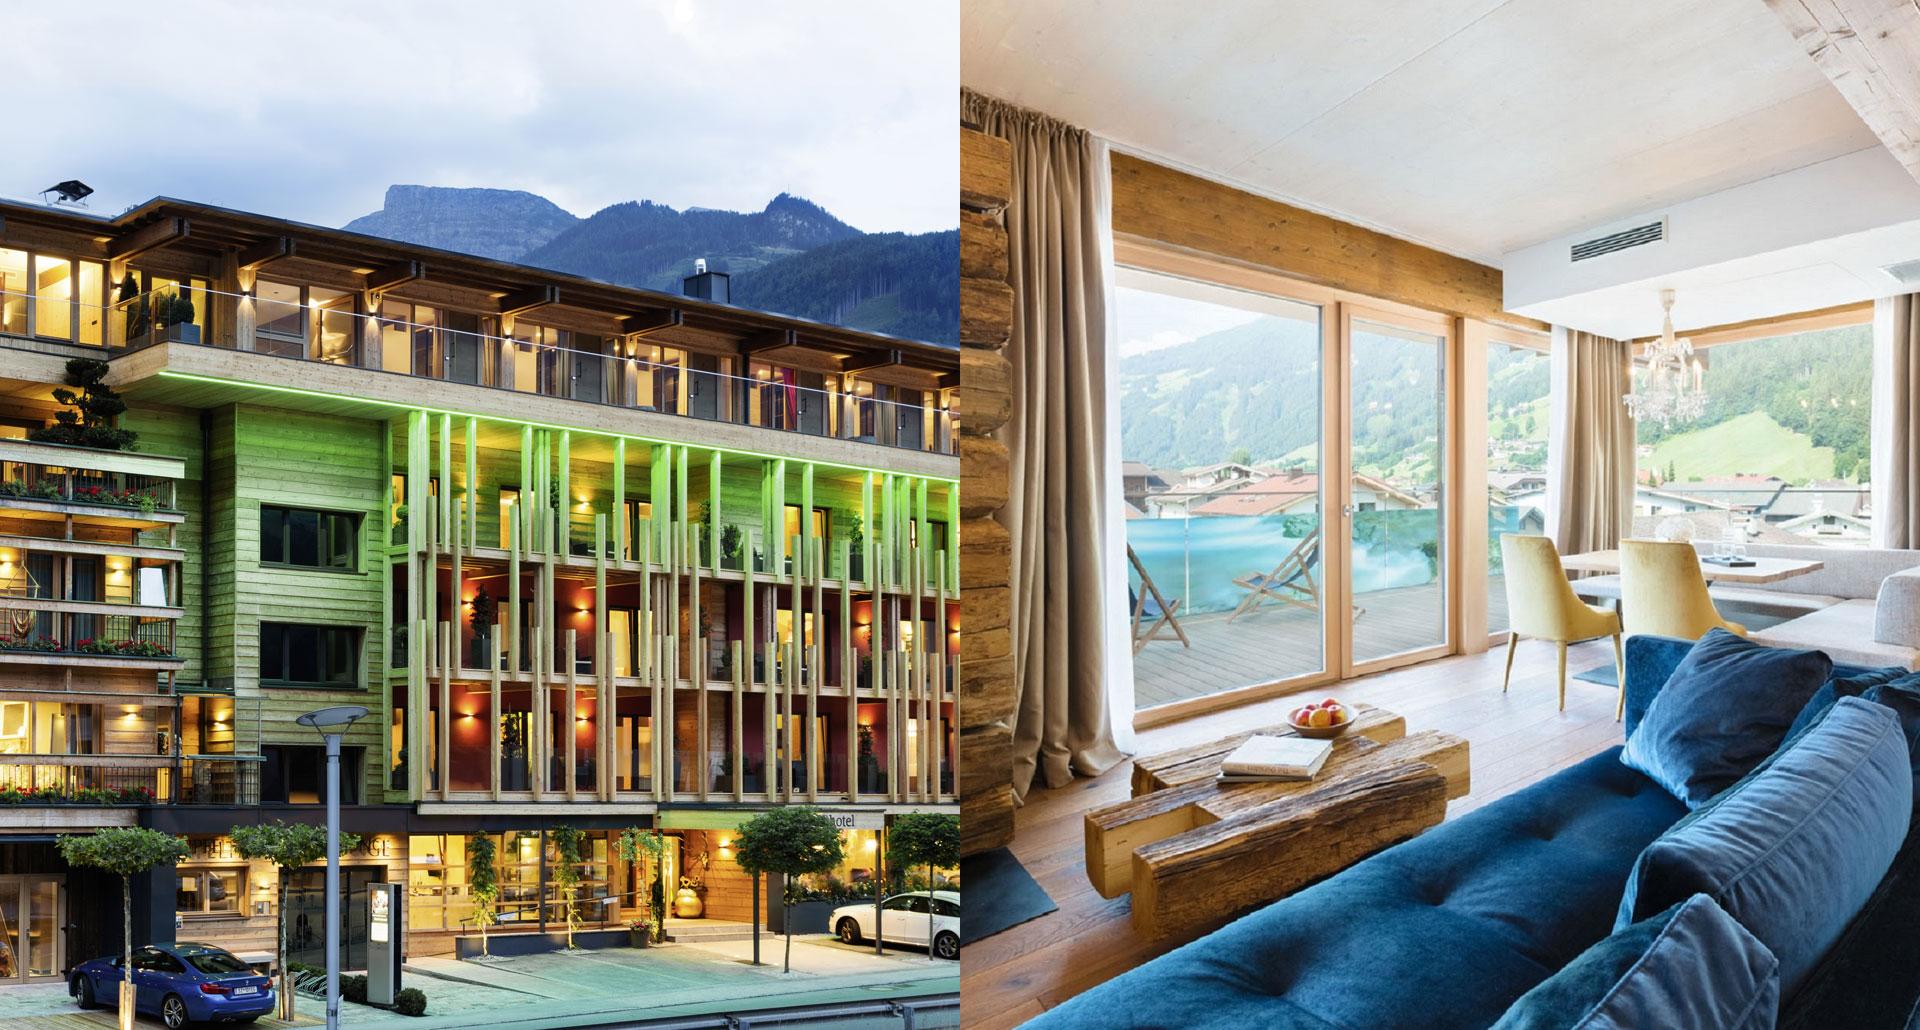 Das Posthotel boutique hotel in Ziller, Austria